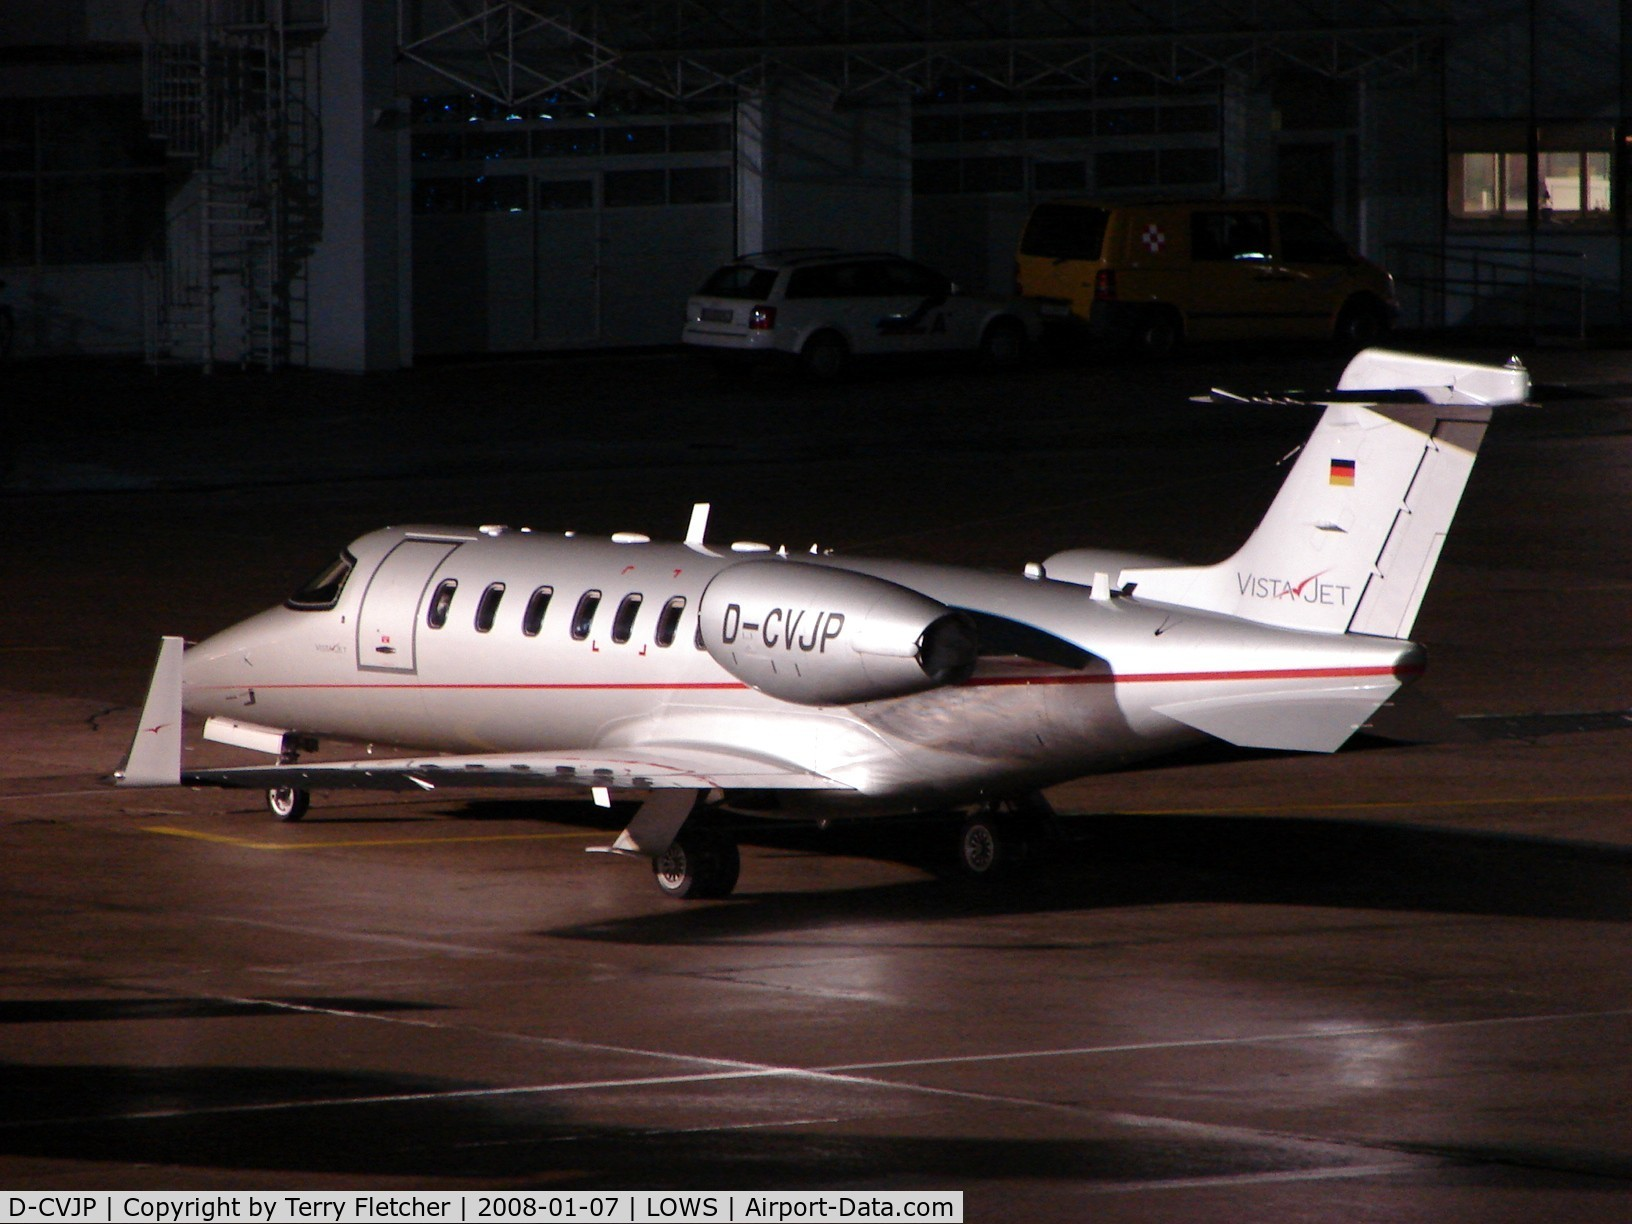 D-CVJP, 2007 Learjet 40 C/N 45-2079, Vistajet's Lear 40 was a nightstopper at Salzburg Airport